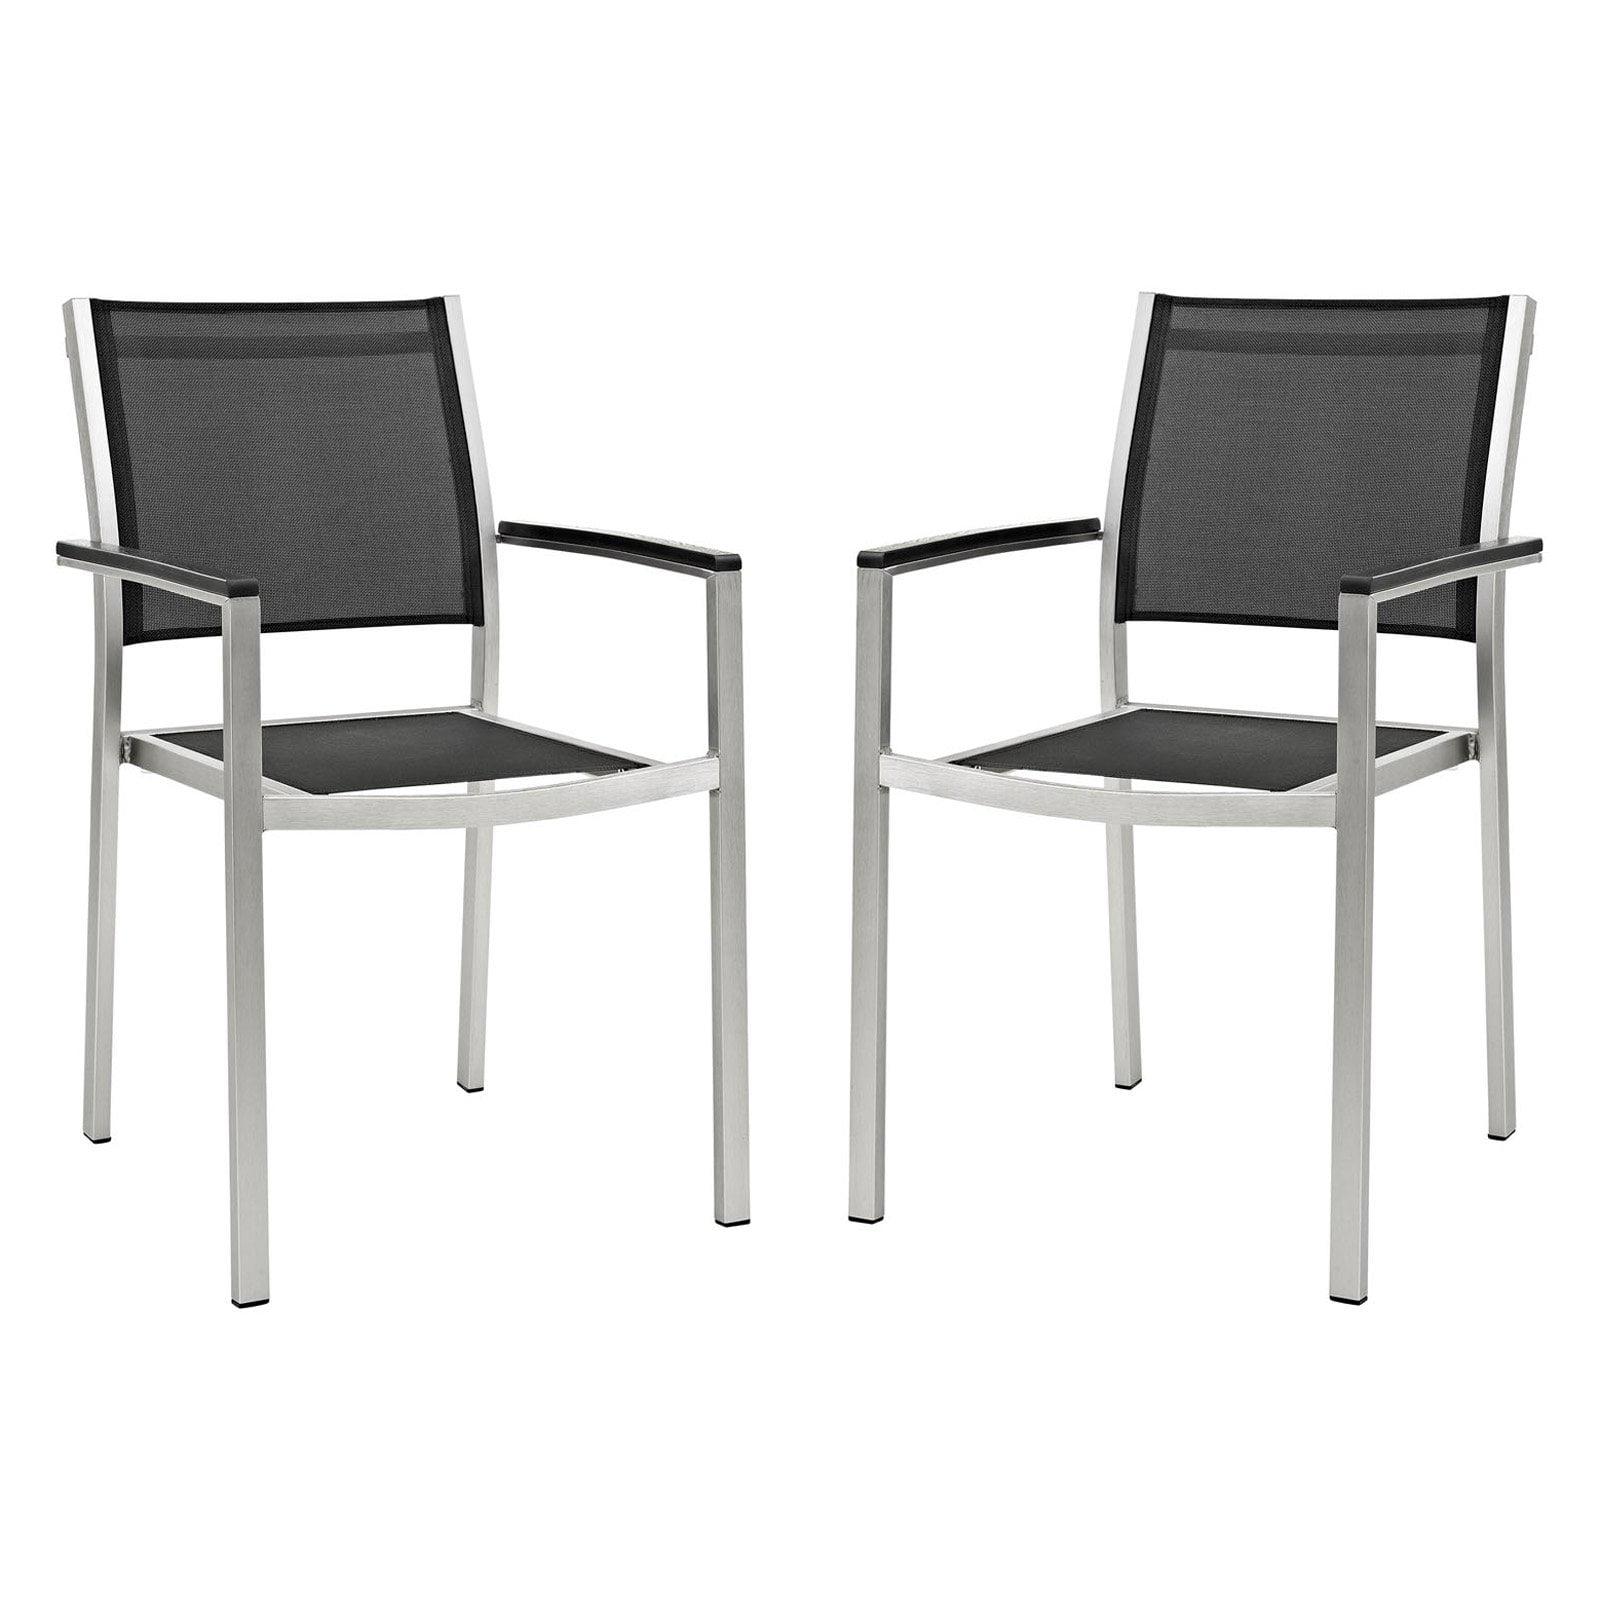 Modway Shore Outdoor Patio Aluminium Dining Chair Set Of 2 Silver Black Walmart Com Walmart Com